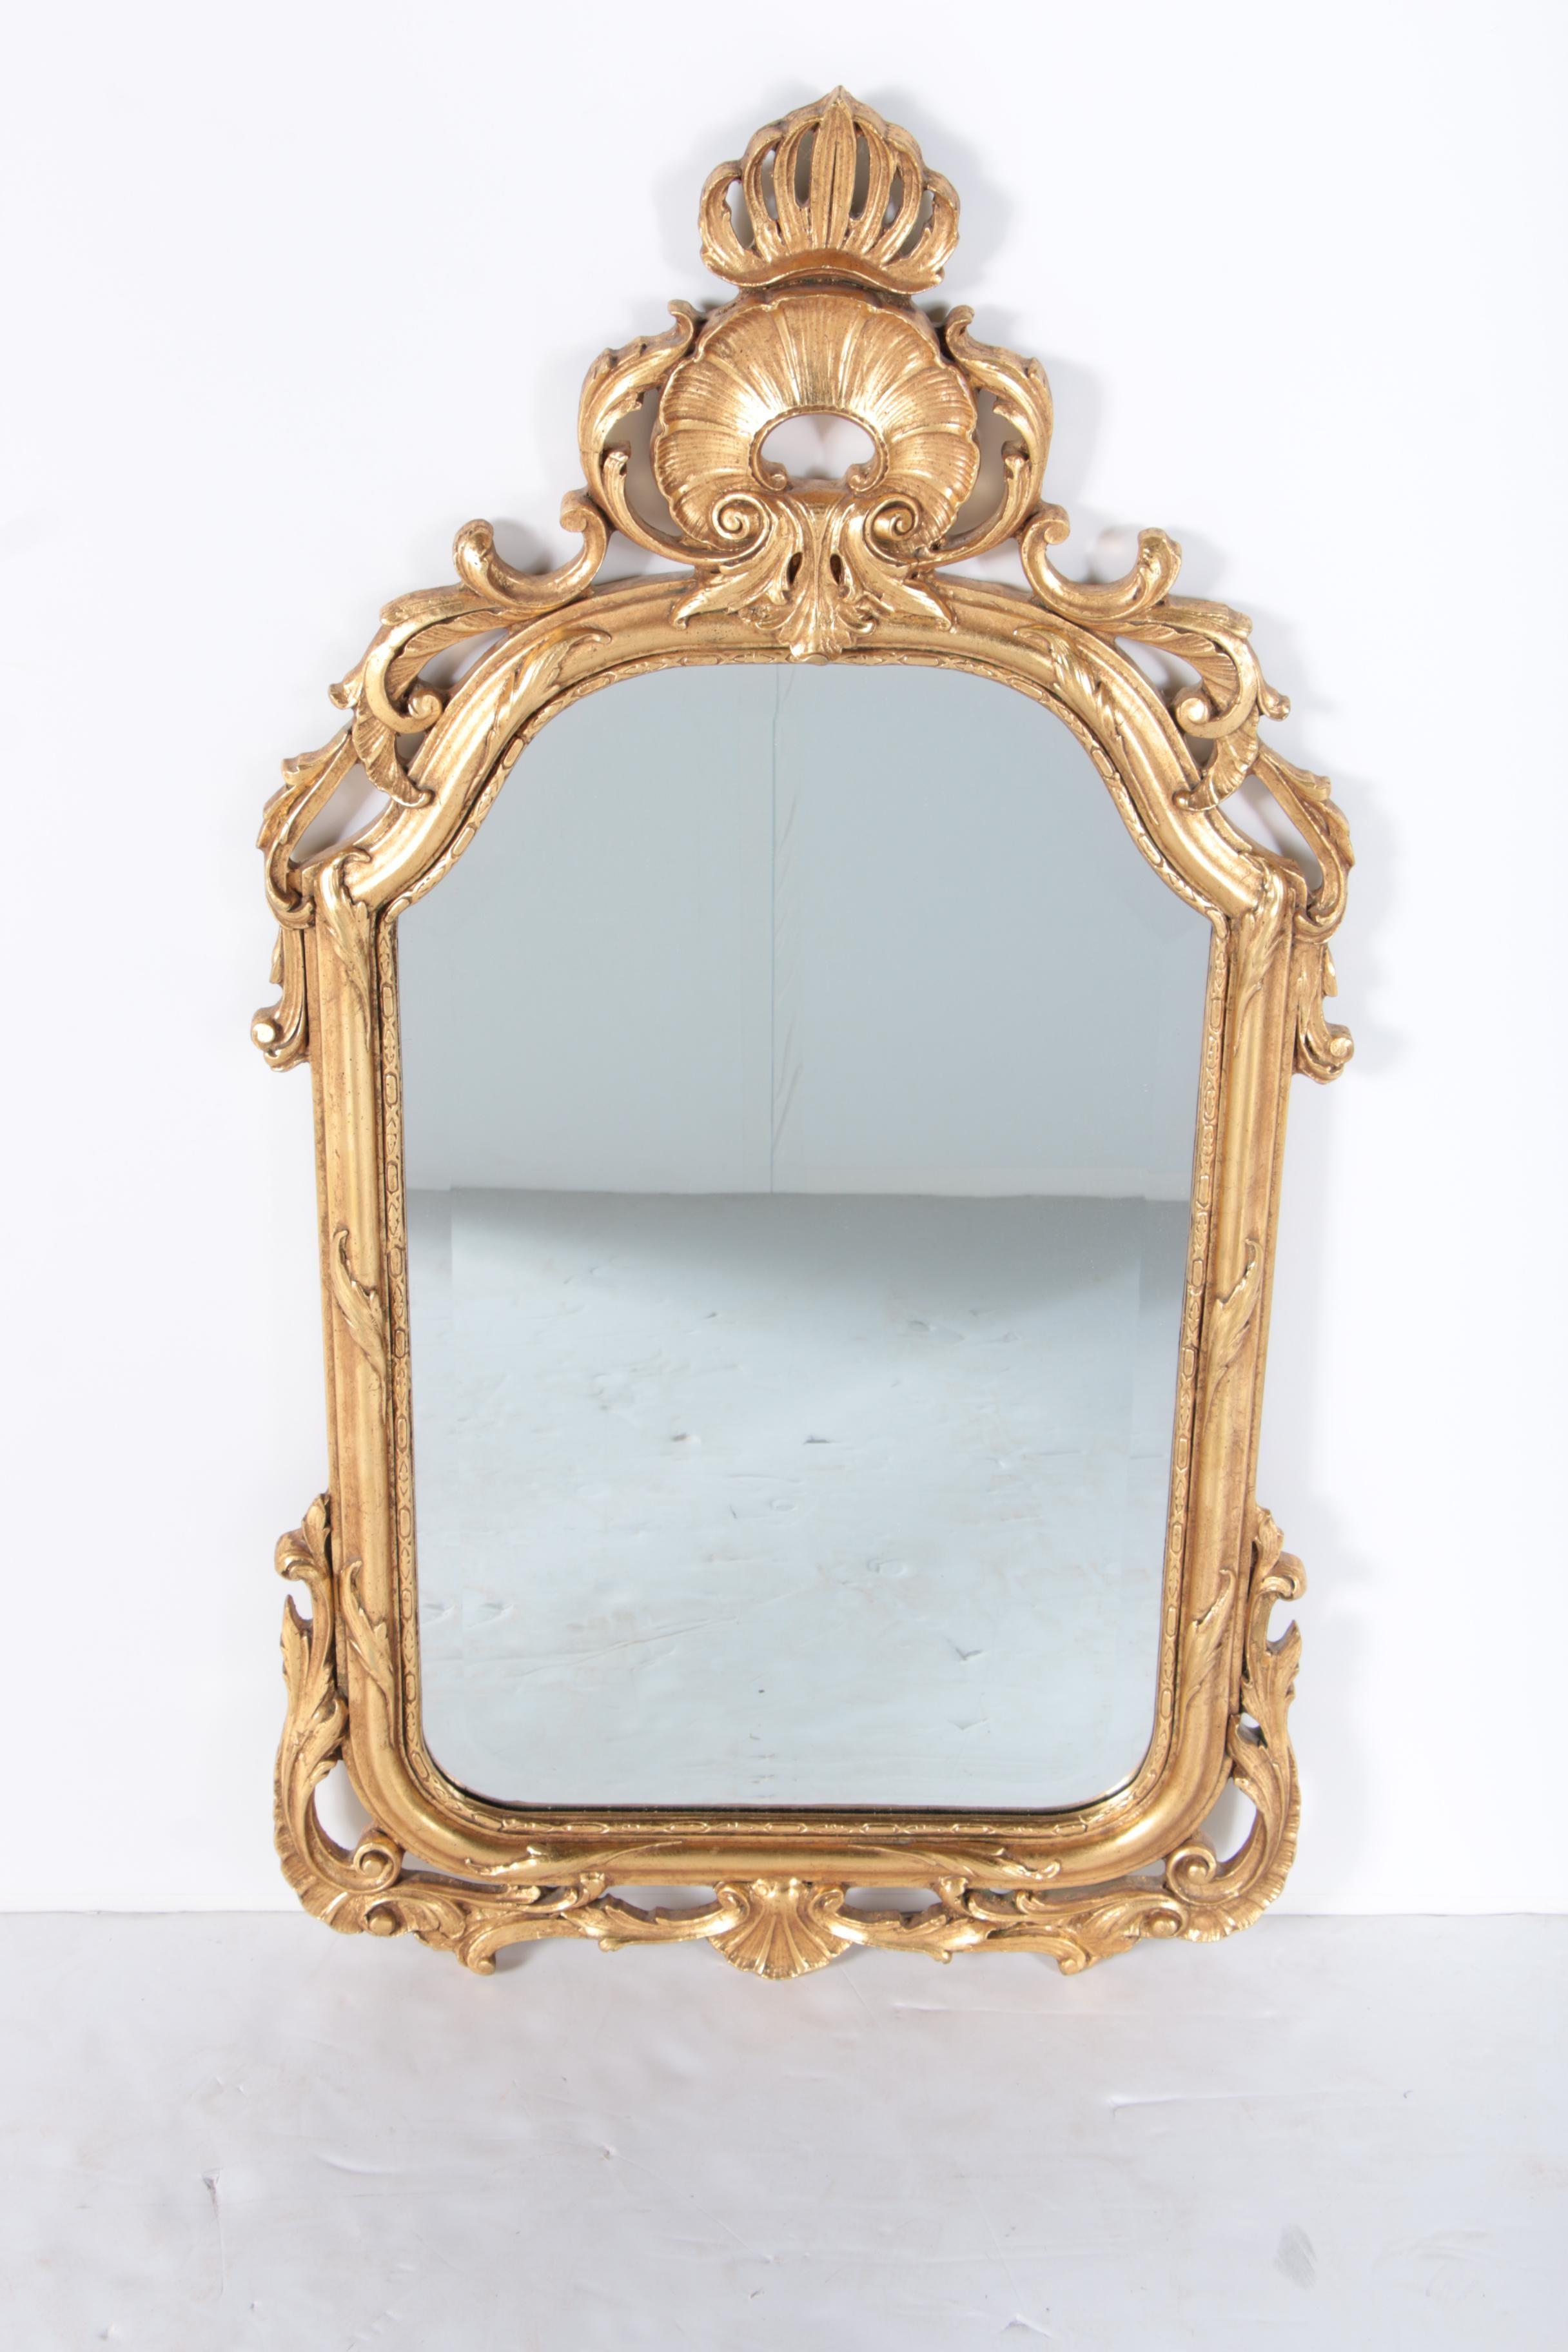 Ornately Framed Beveled Wall Mirror by Jon Rochelle